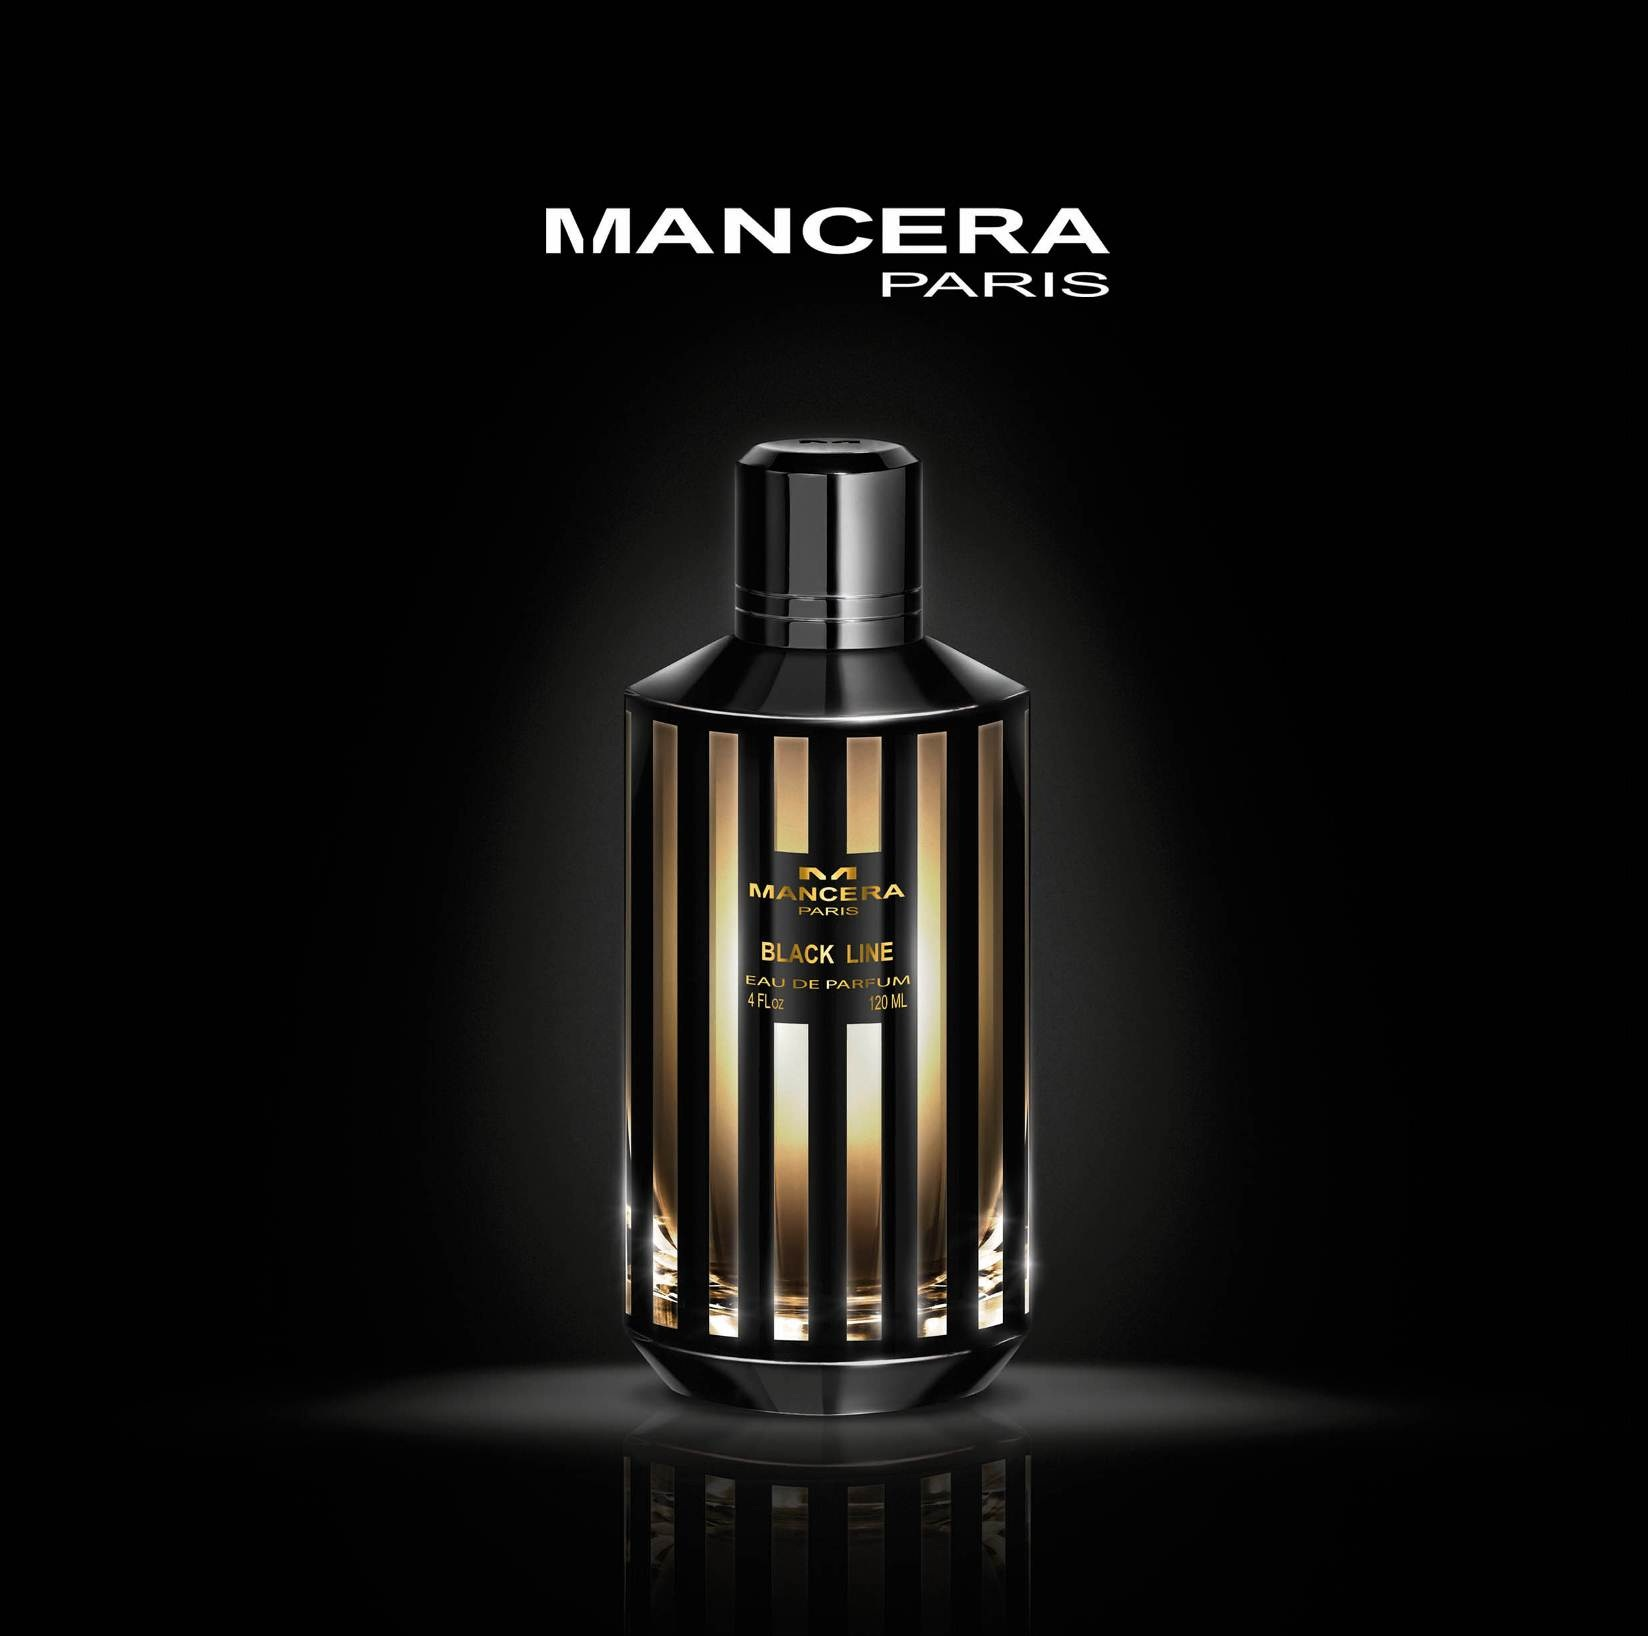 Fall Wood Wallpaper Black Line Mancera Perfume A Fragrance For Women And Men